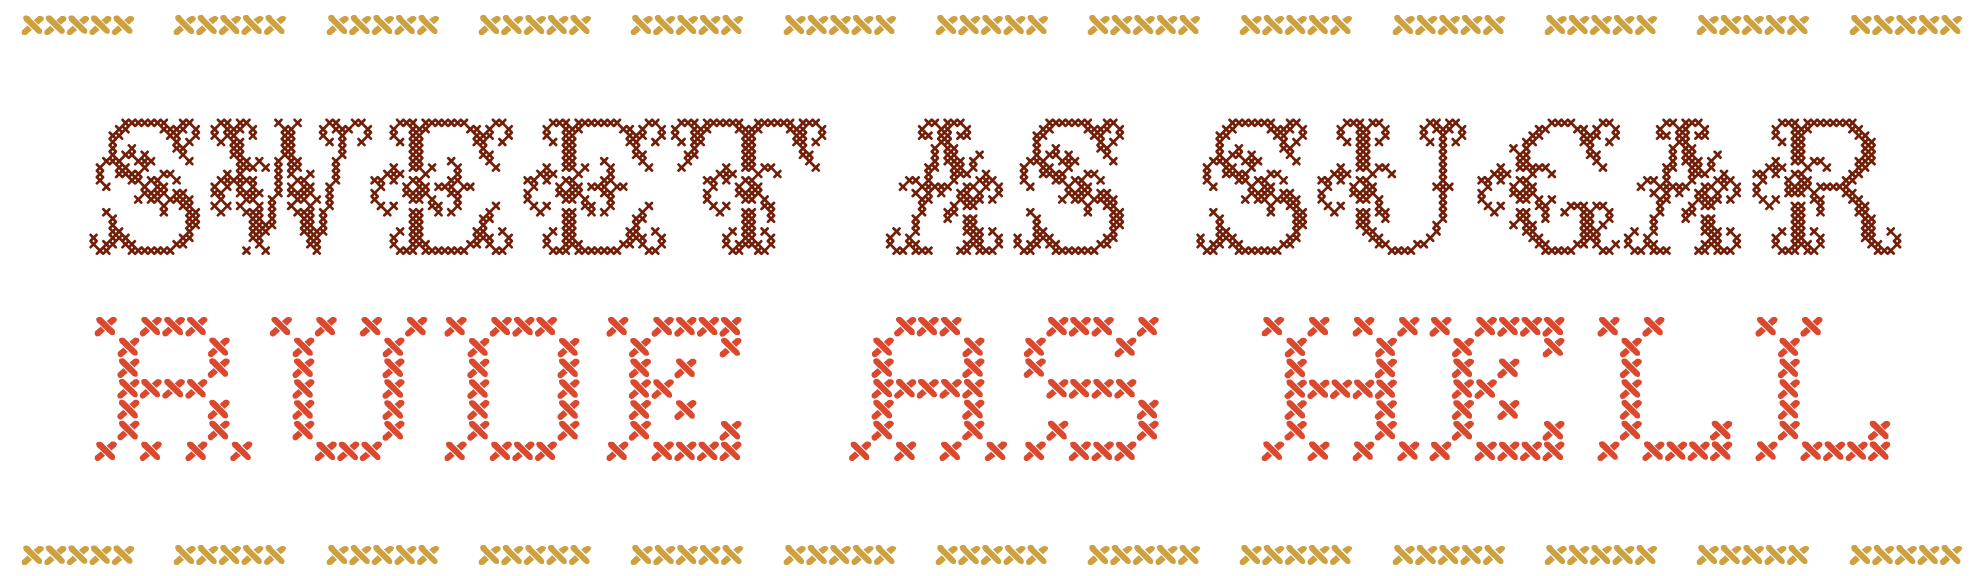 rudisill_cross_sub_18.png